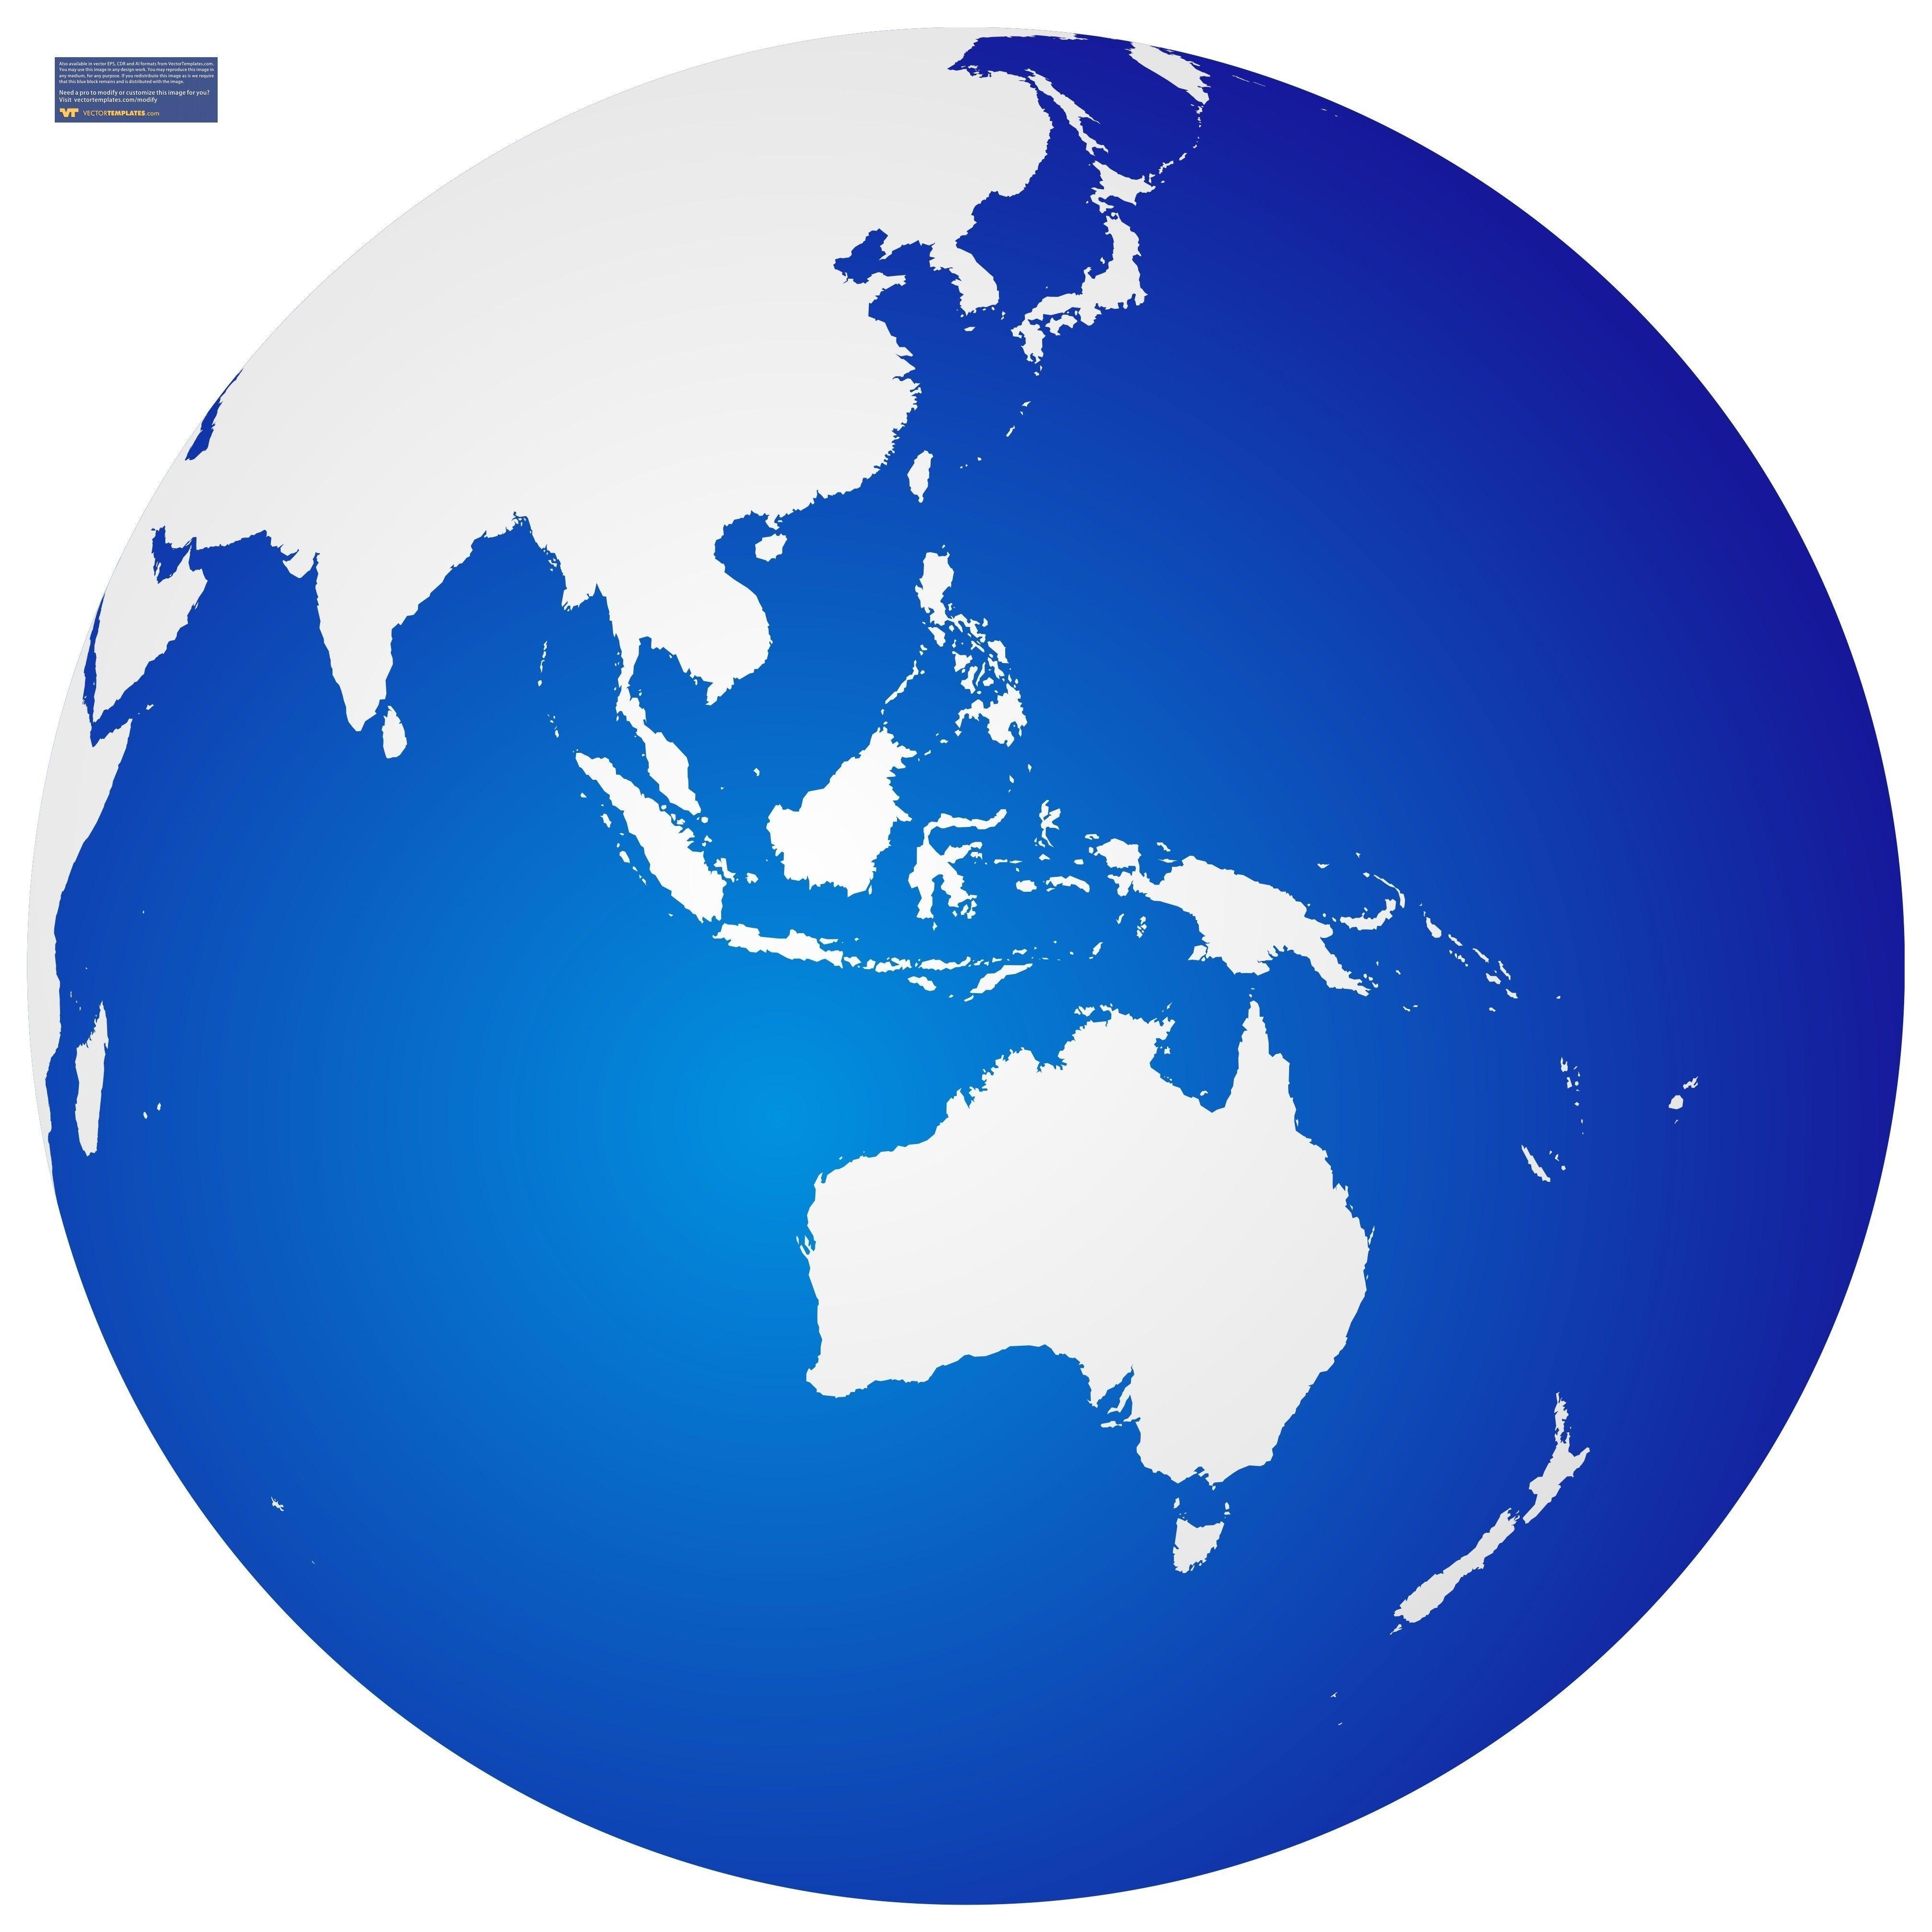 4021x4021 World Map In Globe Vector Copy Best World Map Cartoon Globe